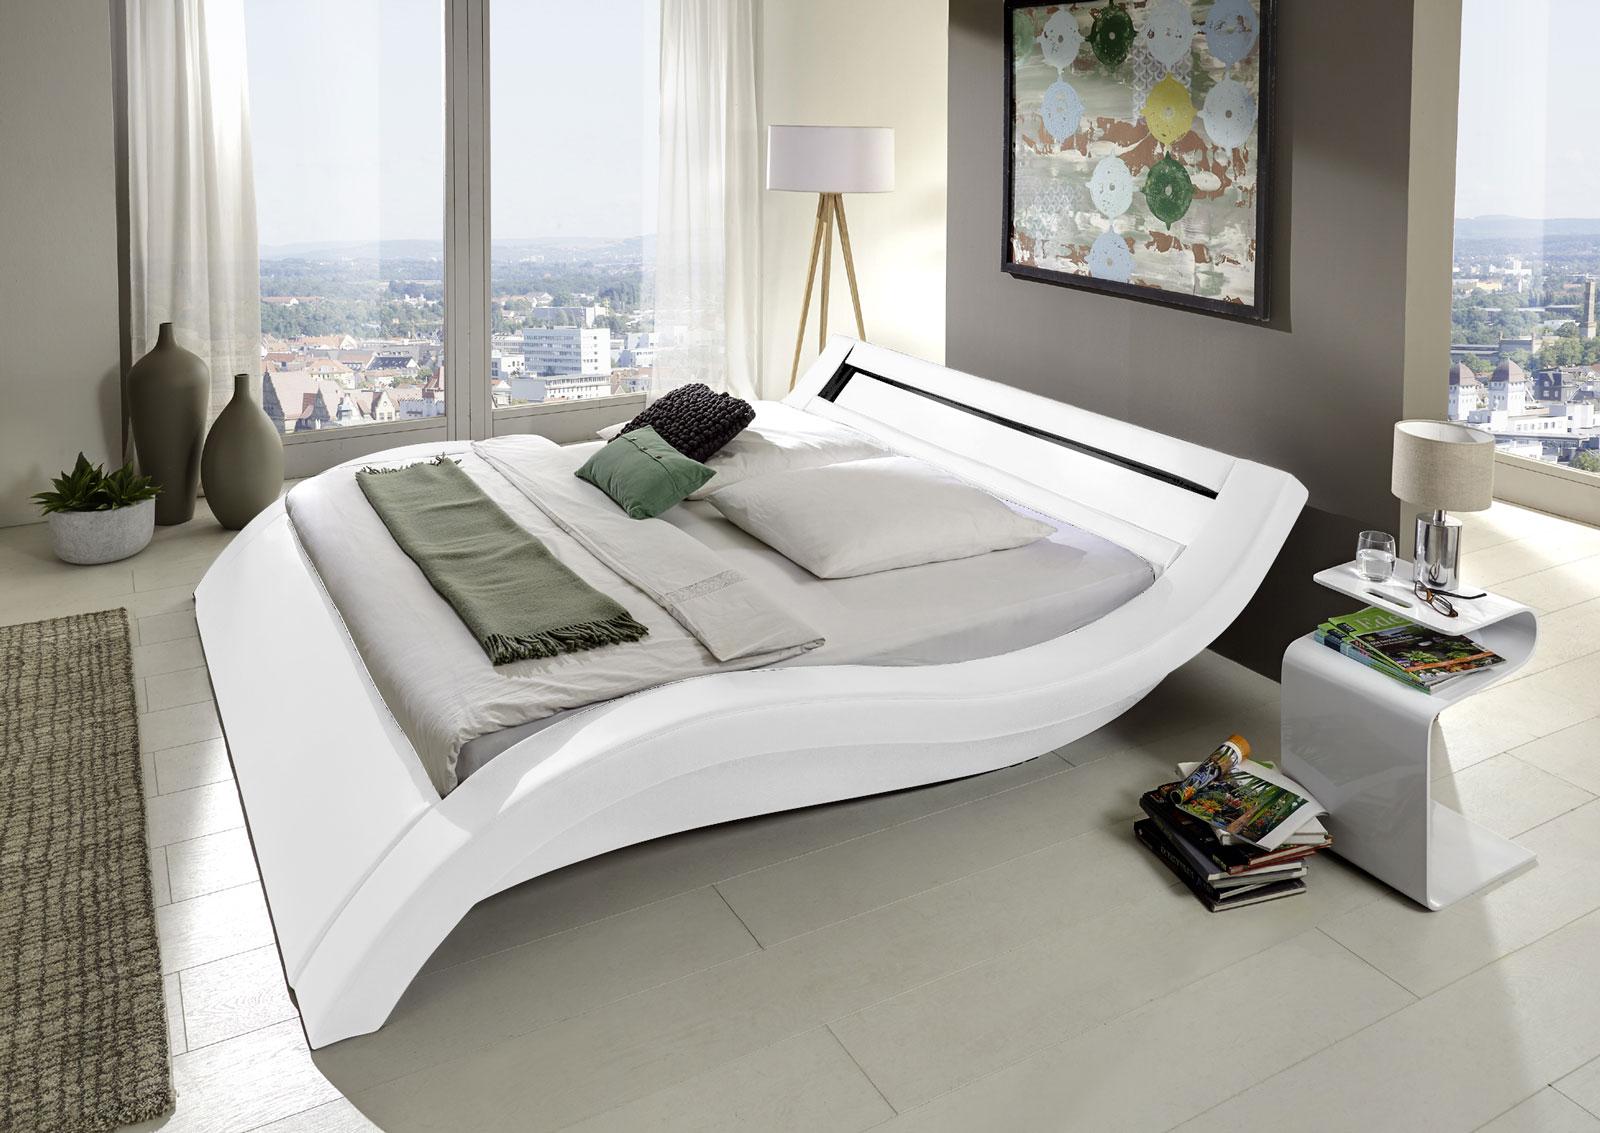 sam polsterbett 160 x 200 cm led beleuchtung wei look. Black Bedroom Furniture Sets. Home Design Ideas